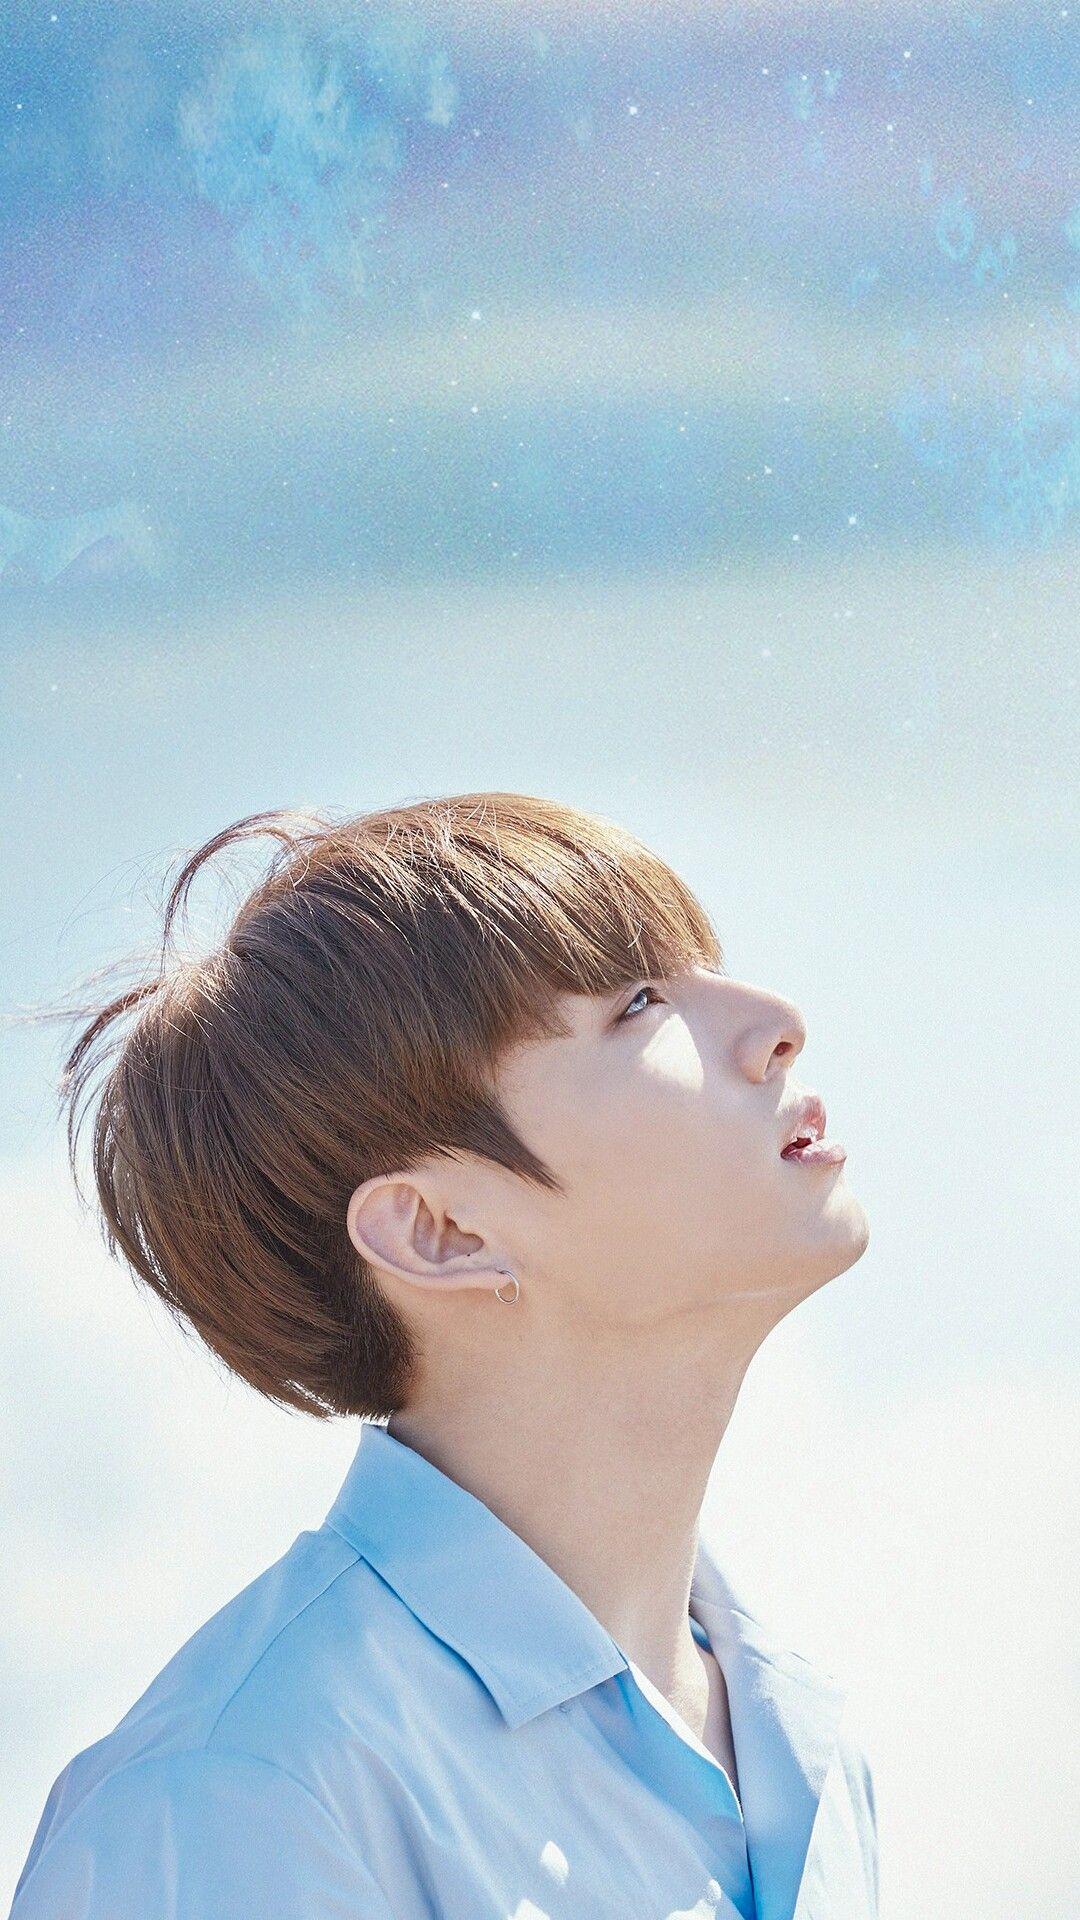 BTS Jungkook Wallpapers   Top BTS Jungkook Backgrounds 1080x1920